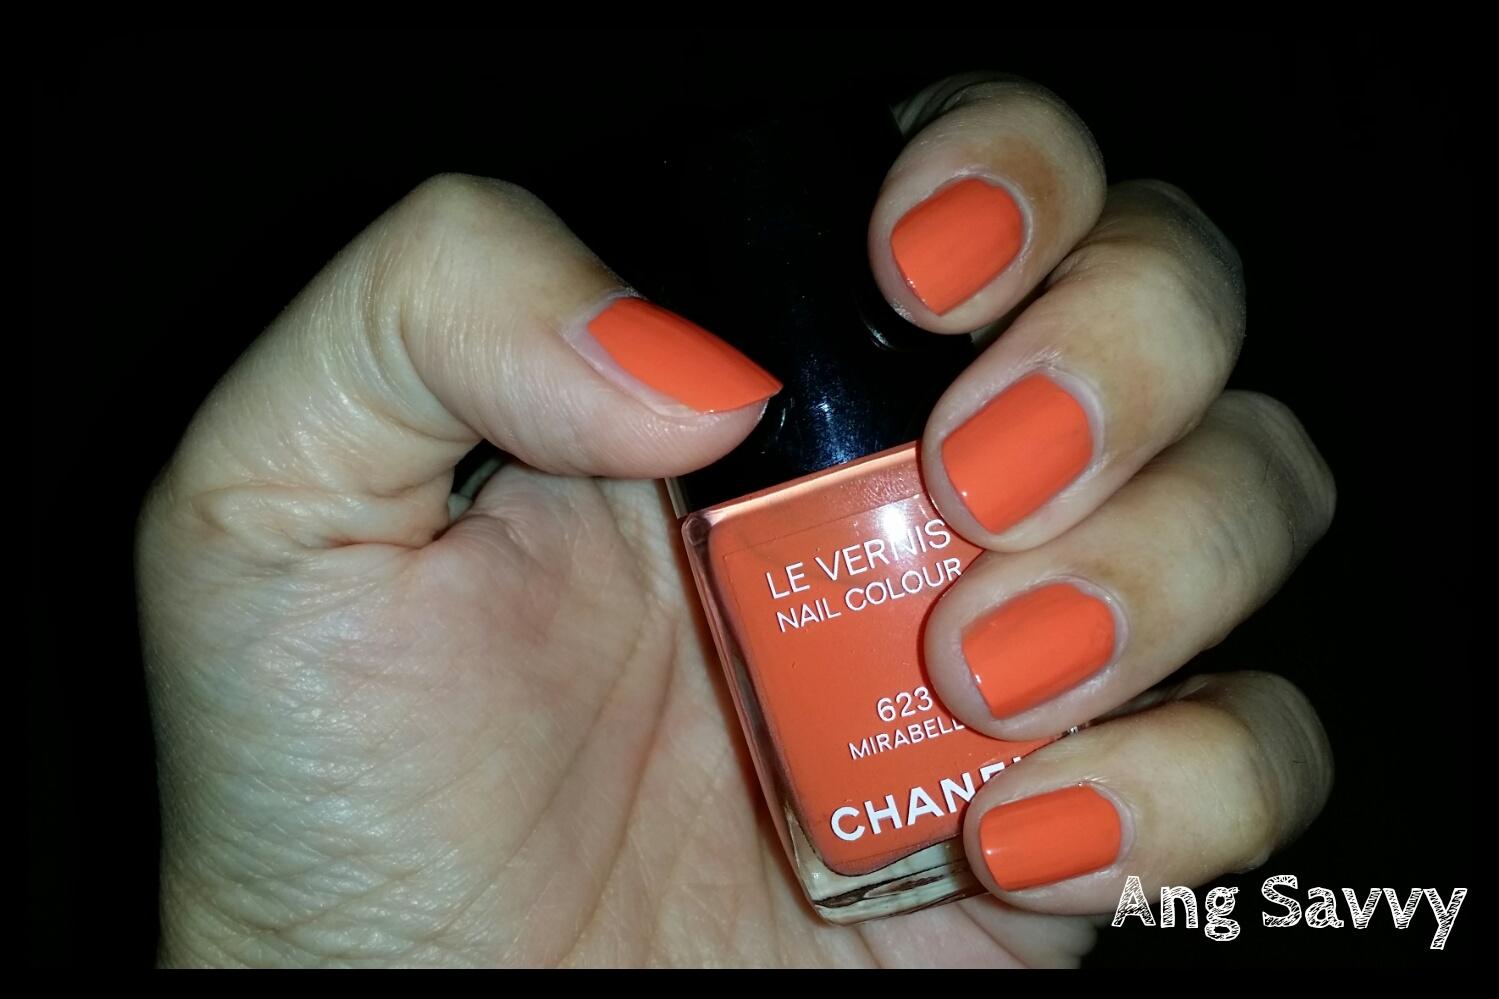 Chanel Le Vernis Nail Colour 623 Mirabella